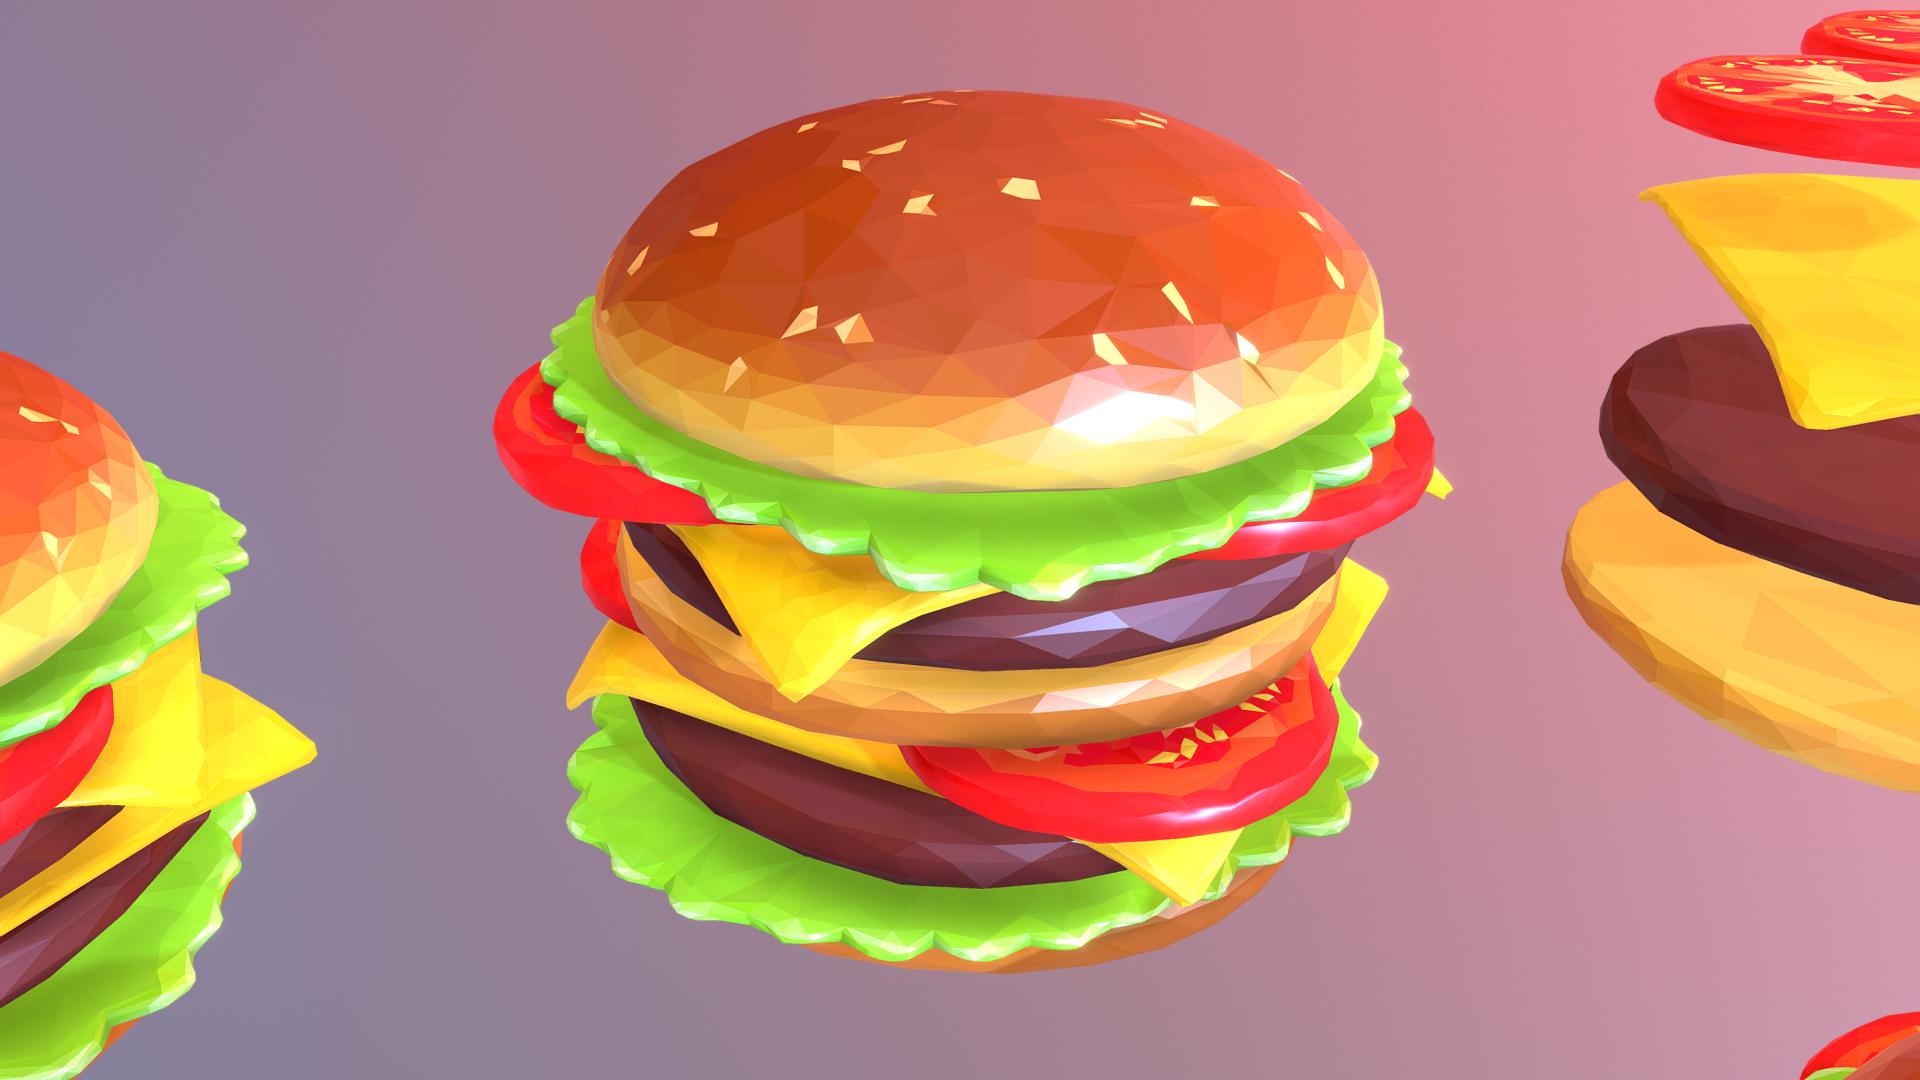 zemspolitārs burgers siersburgers konstruktors 3d modelis 3ds max fbx jpg ma mb faktūra obj 269555